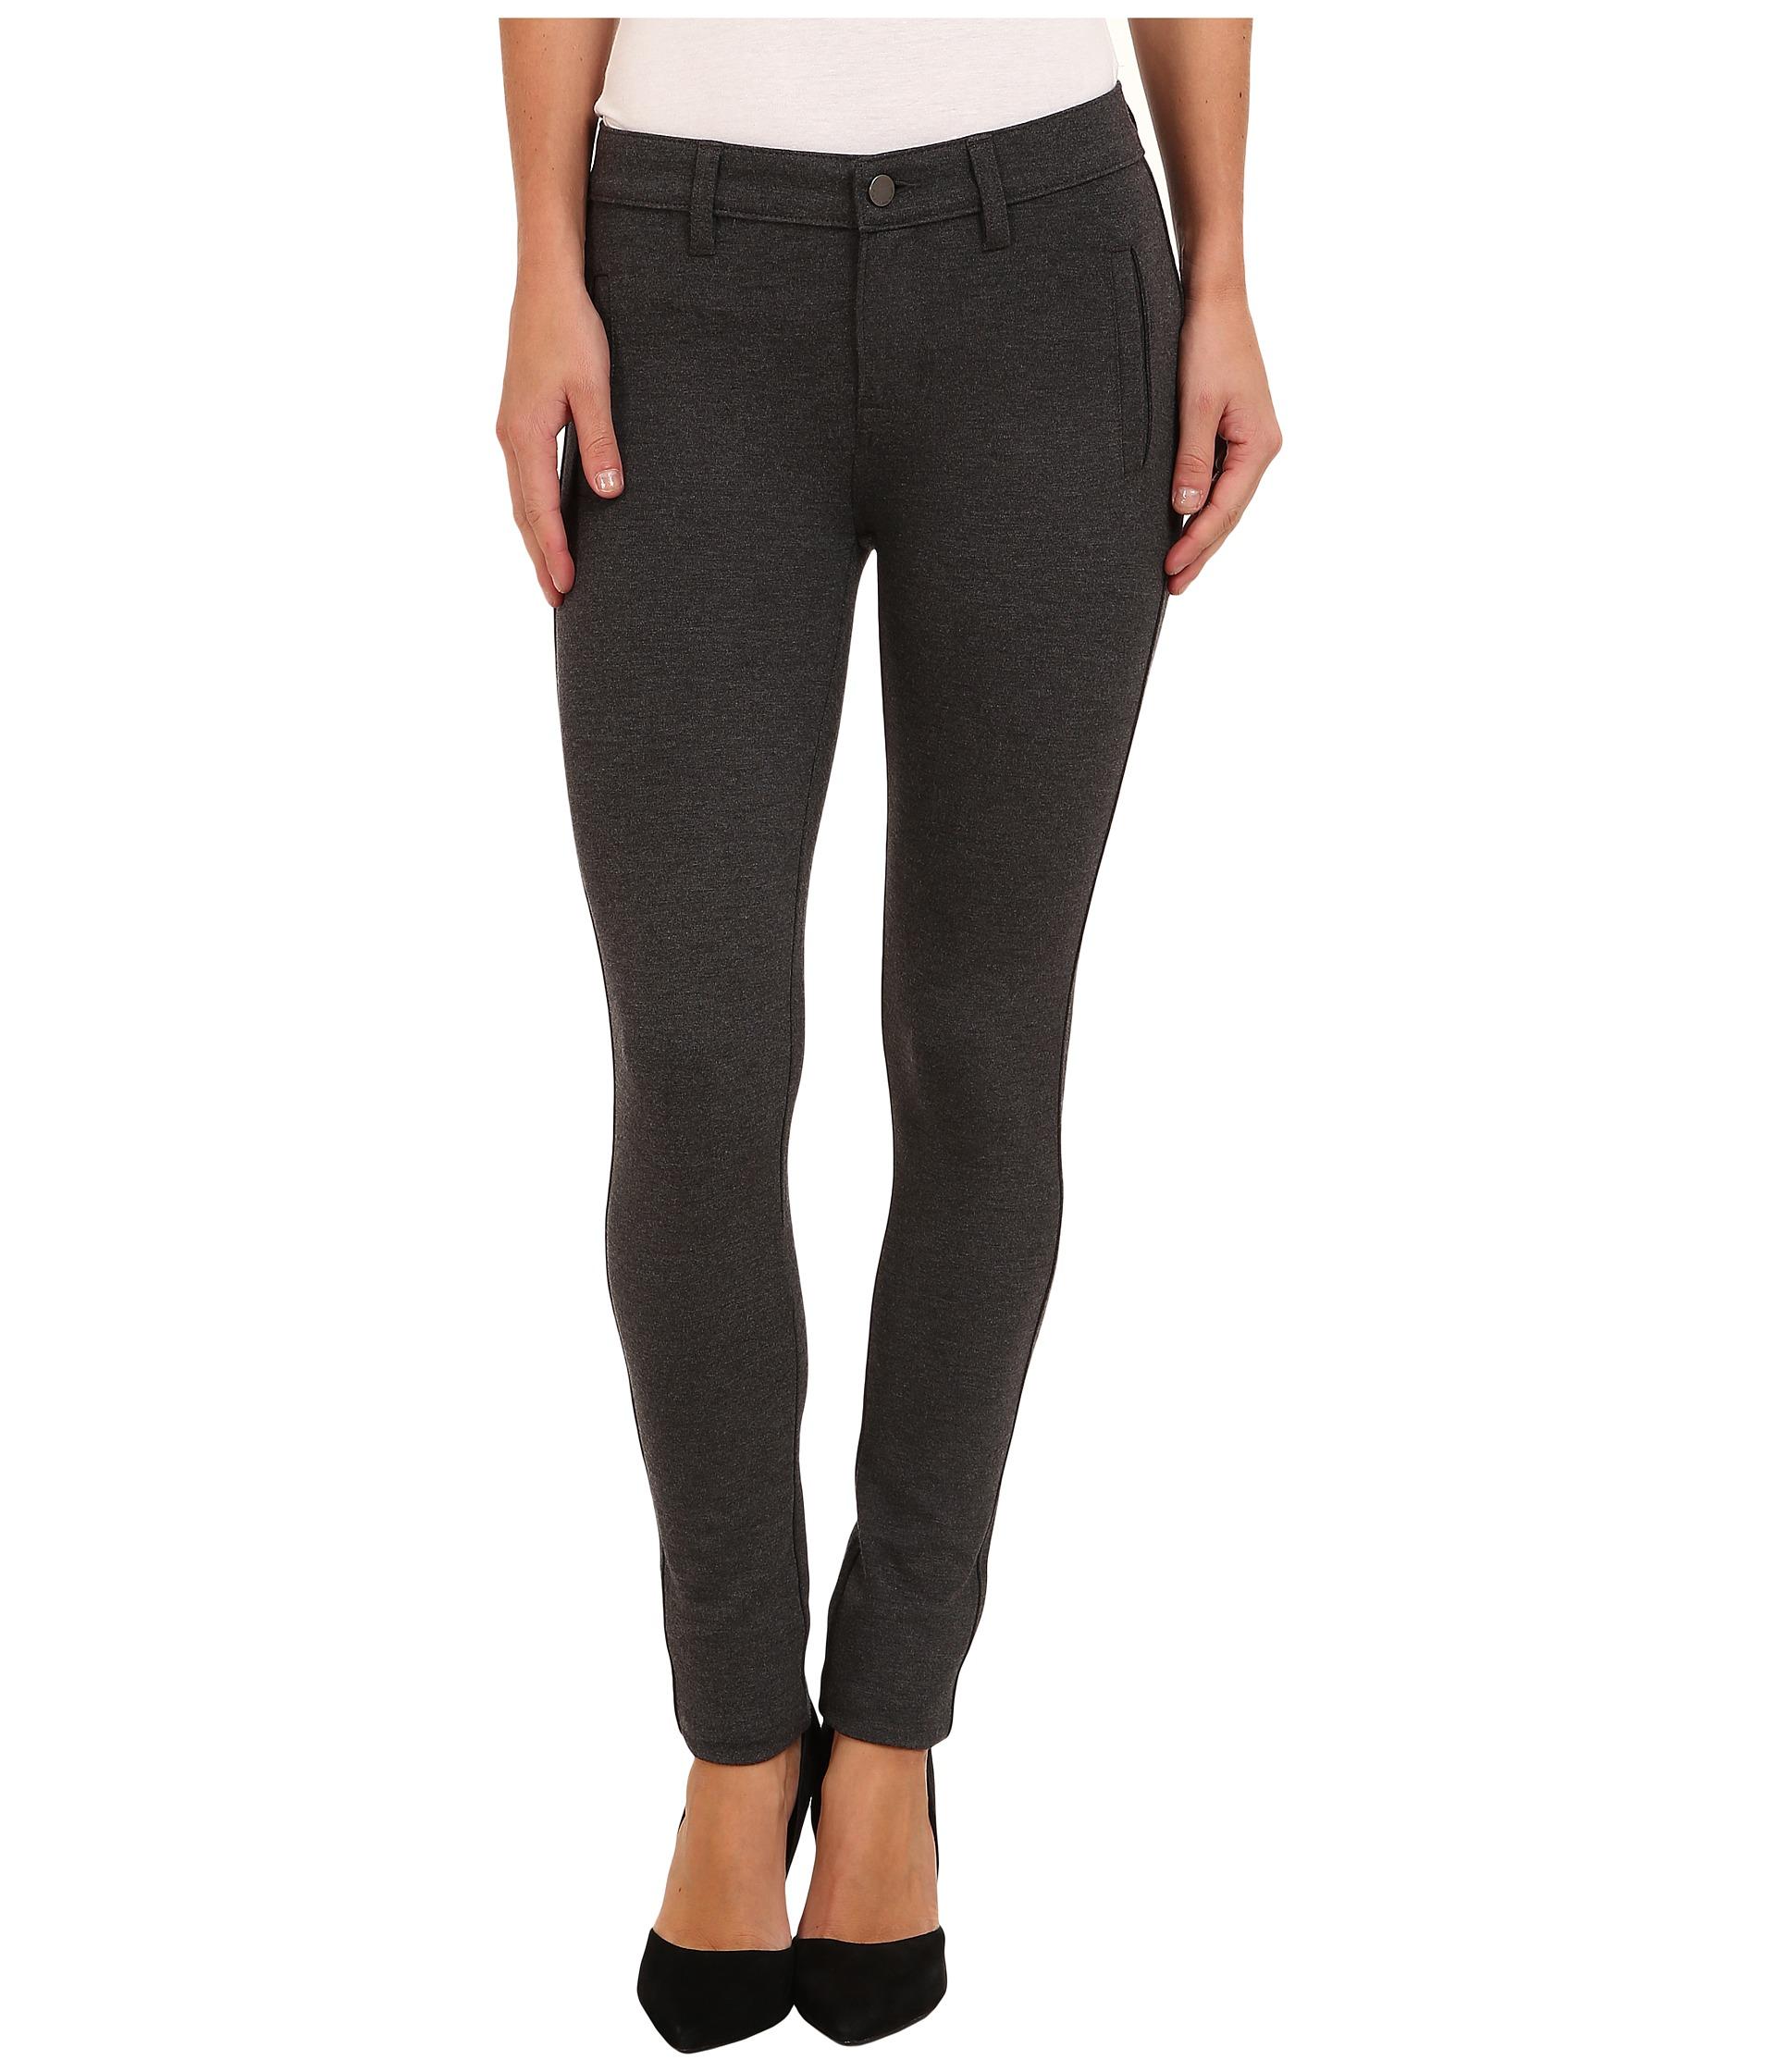 Elegant Calvin Klein Jeans Ladies Long Cardigan